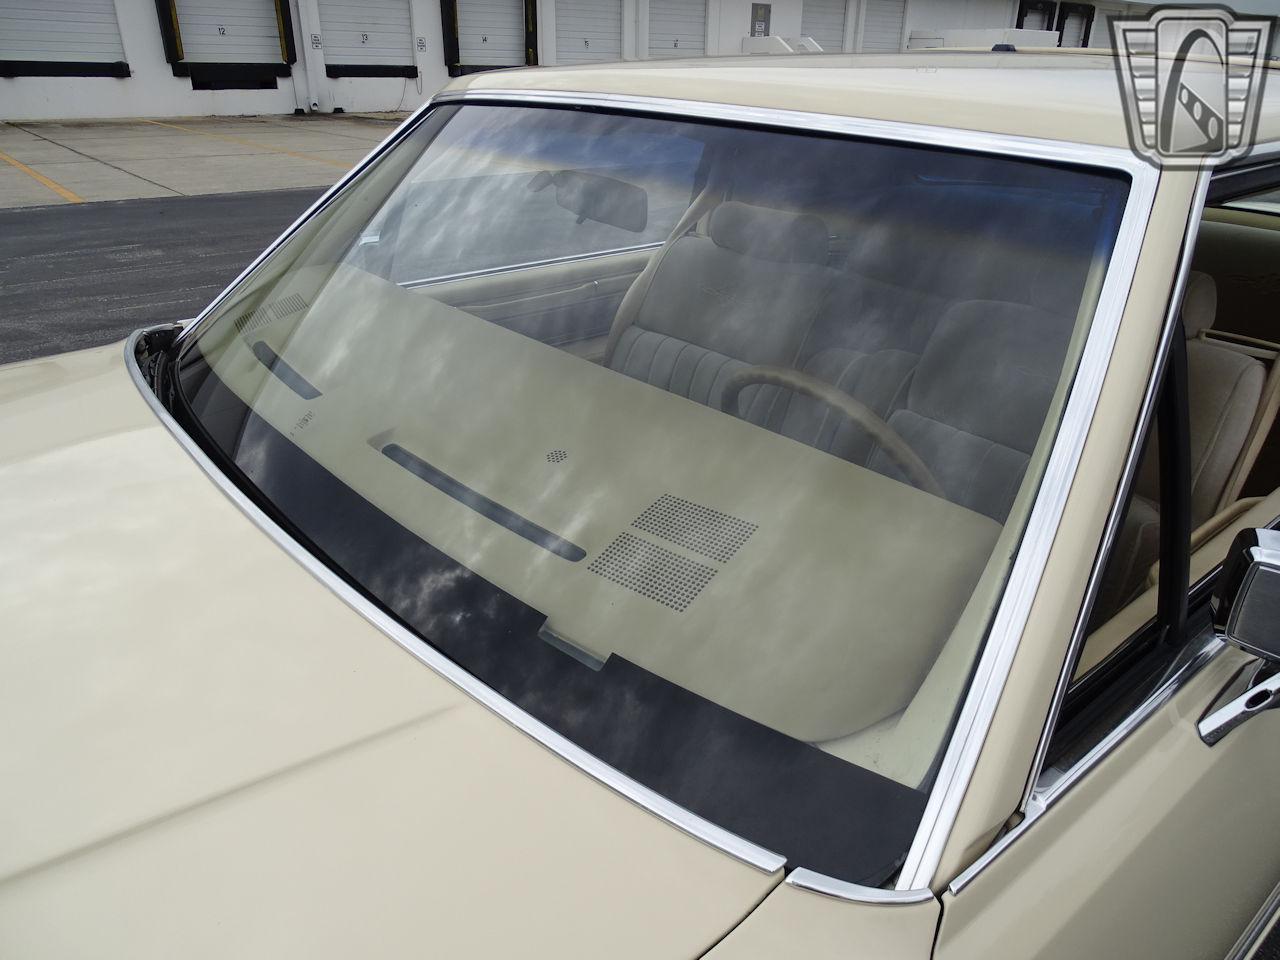 1983 Lincoln Continental 93